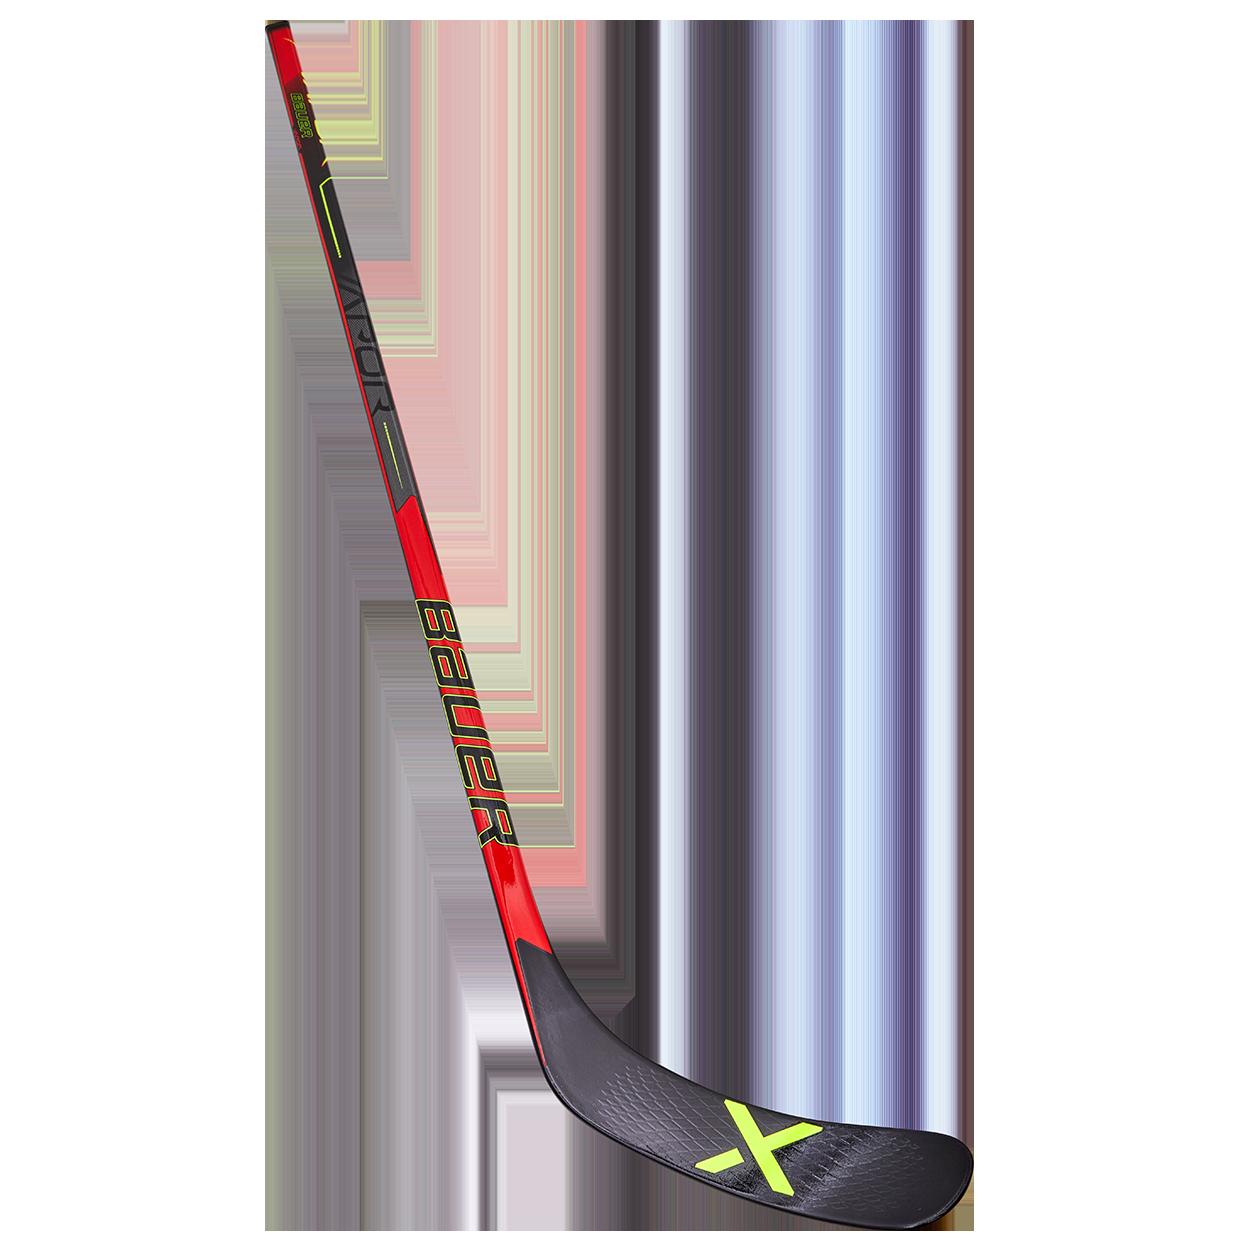 VAPOR TYKE Griptac Stick